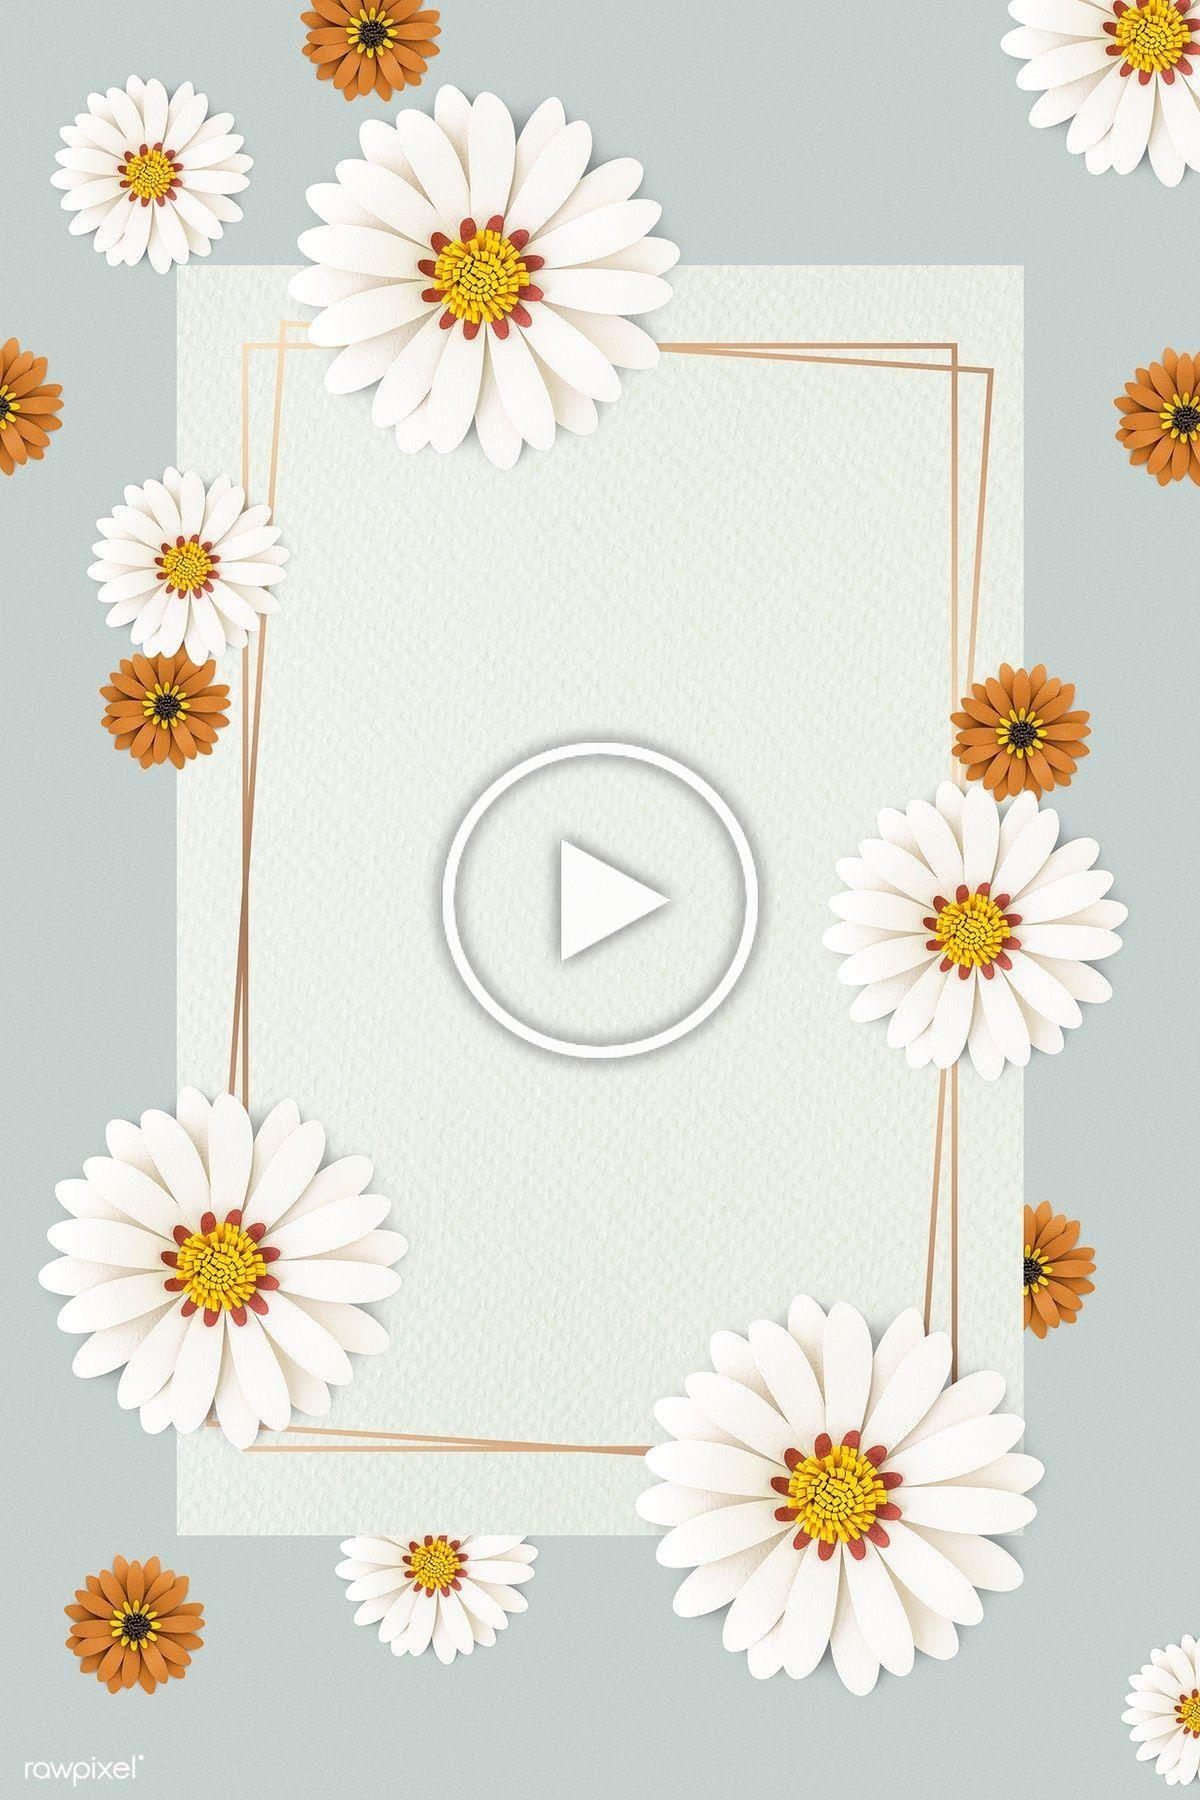 White paper craft daisy flower on light blue background